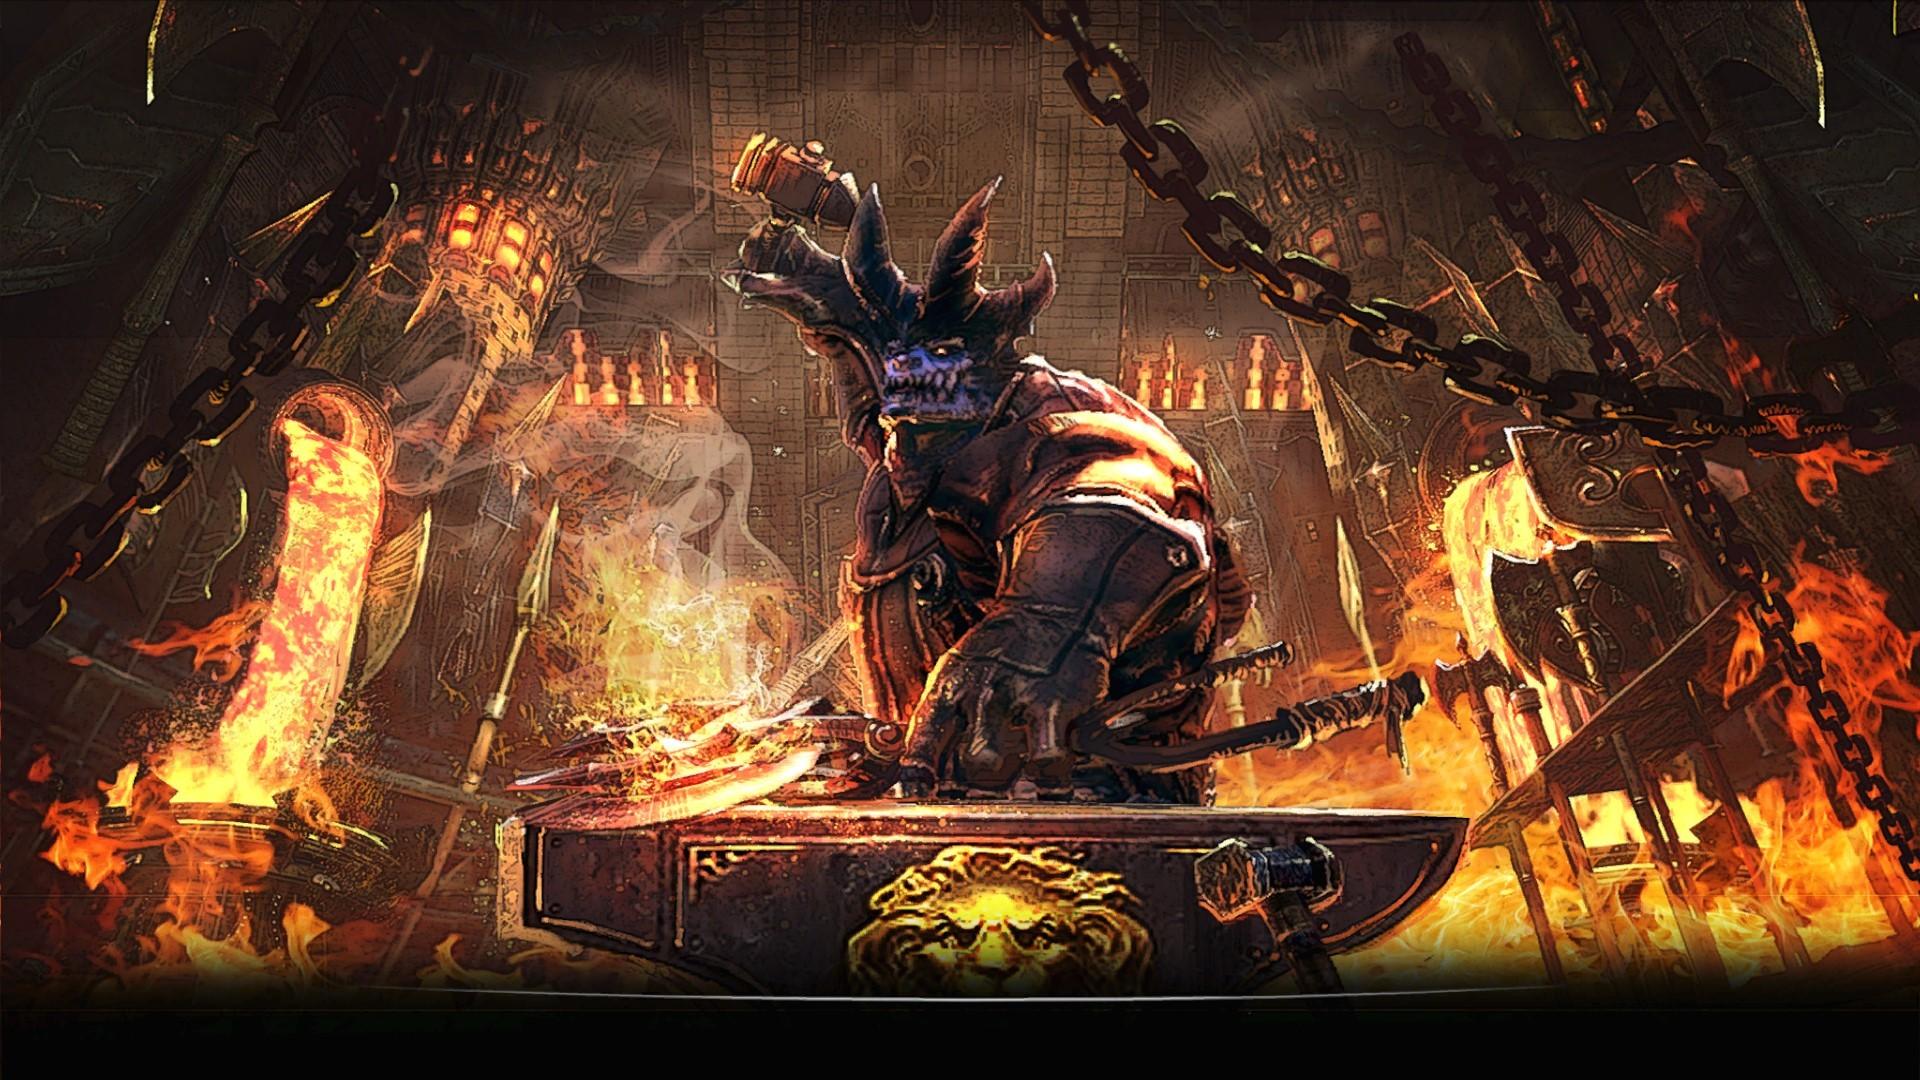 TERA ONLINE fantasy adventure game (106) wallpaper     212171    WallpaperUP